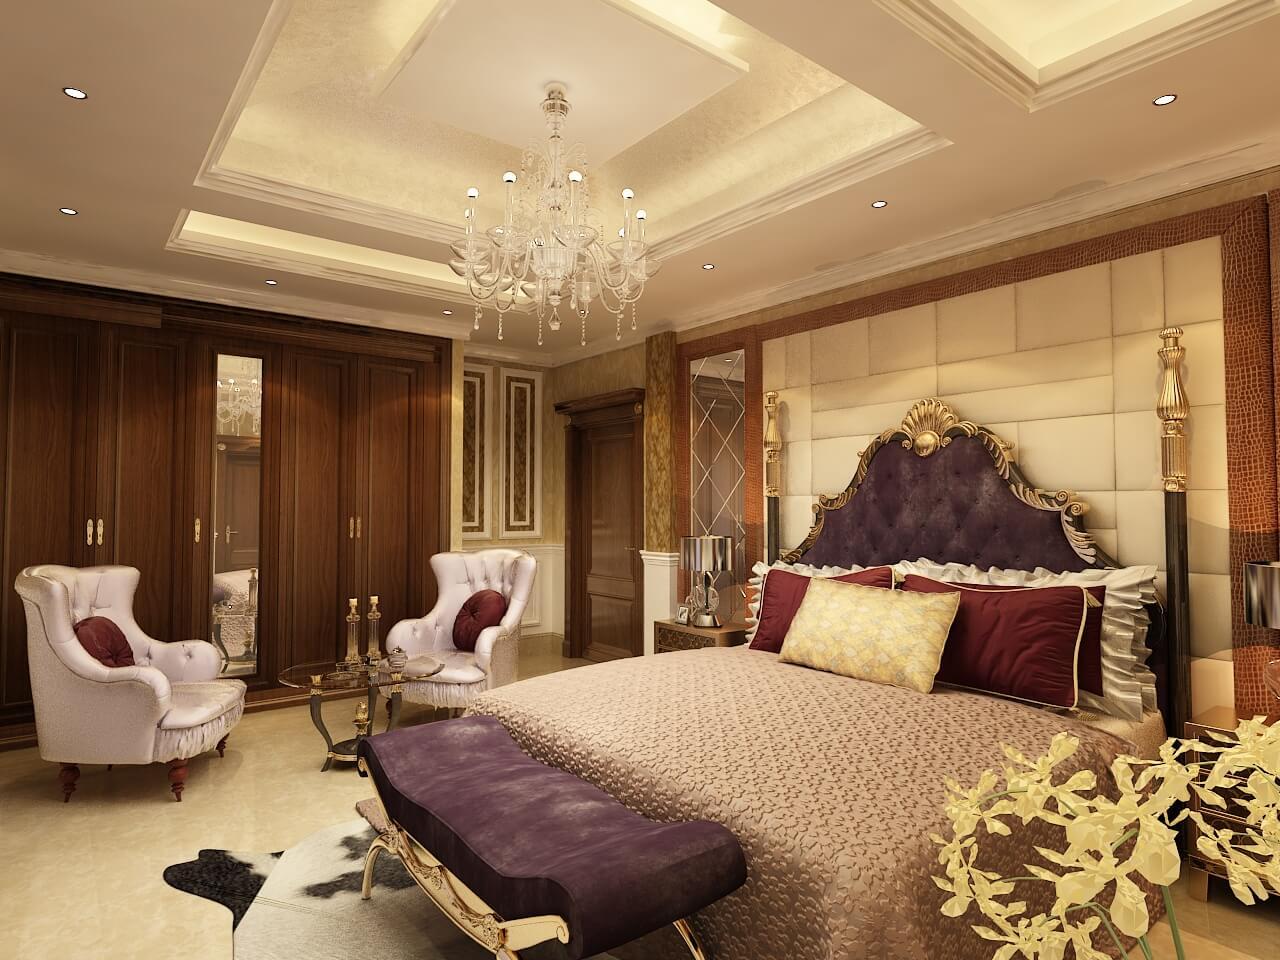 Private Villa - Jumeirah - 4